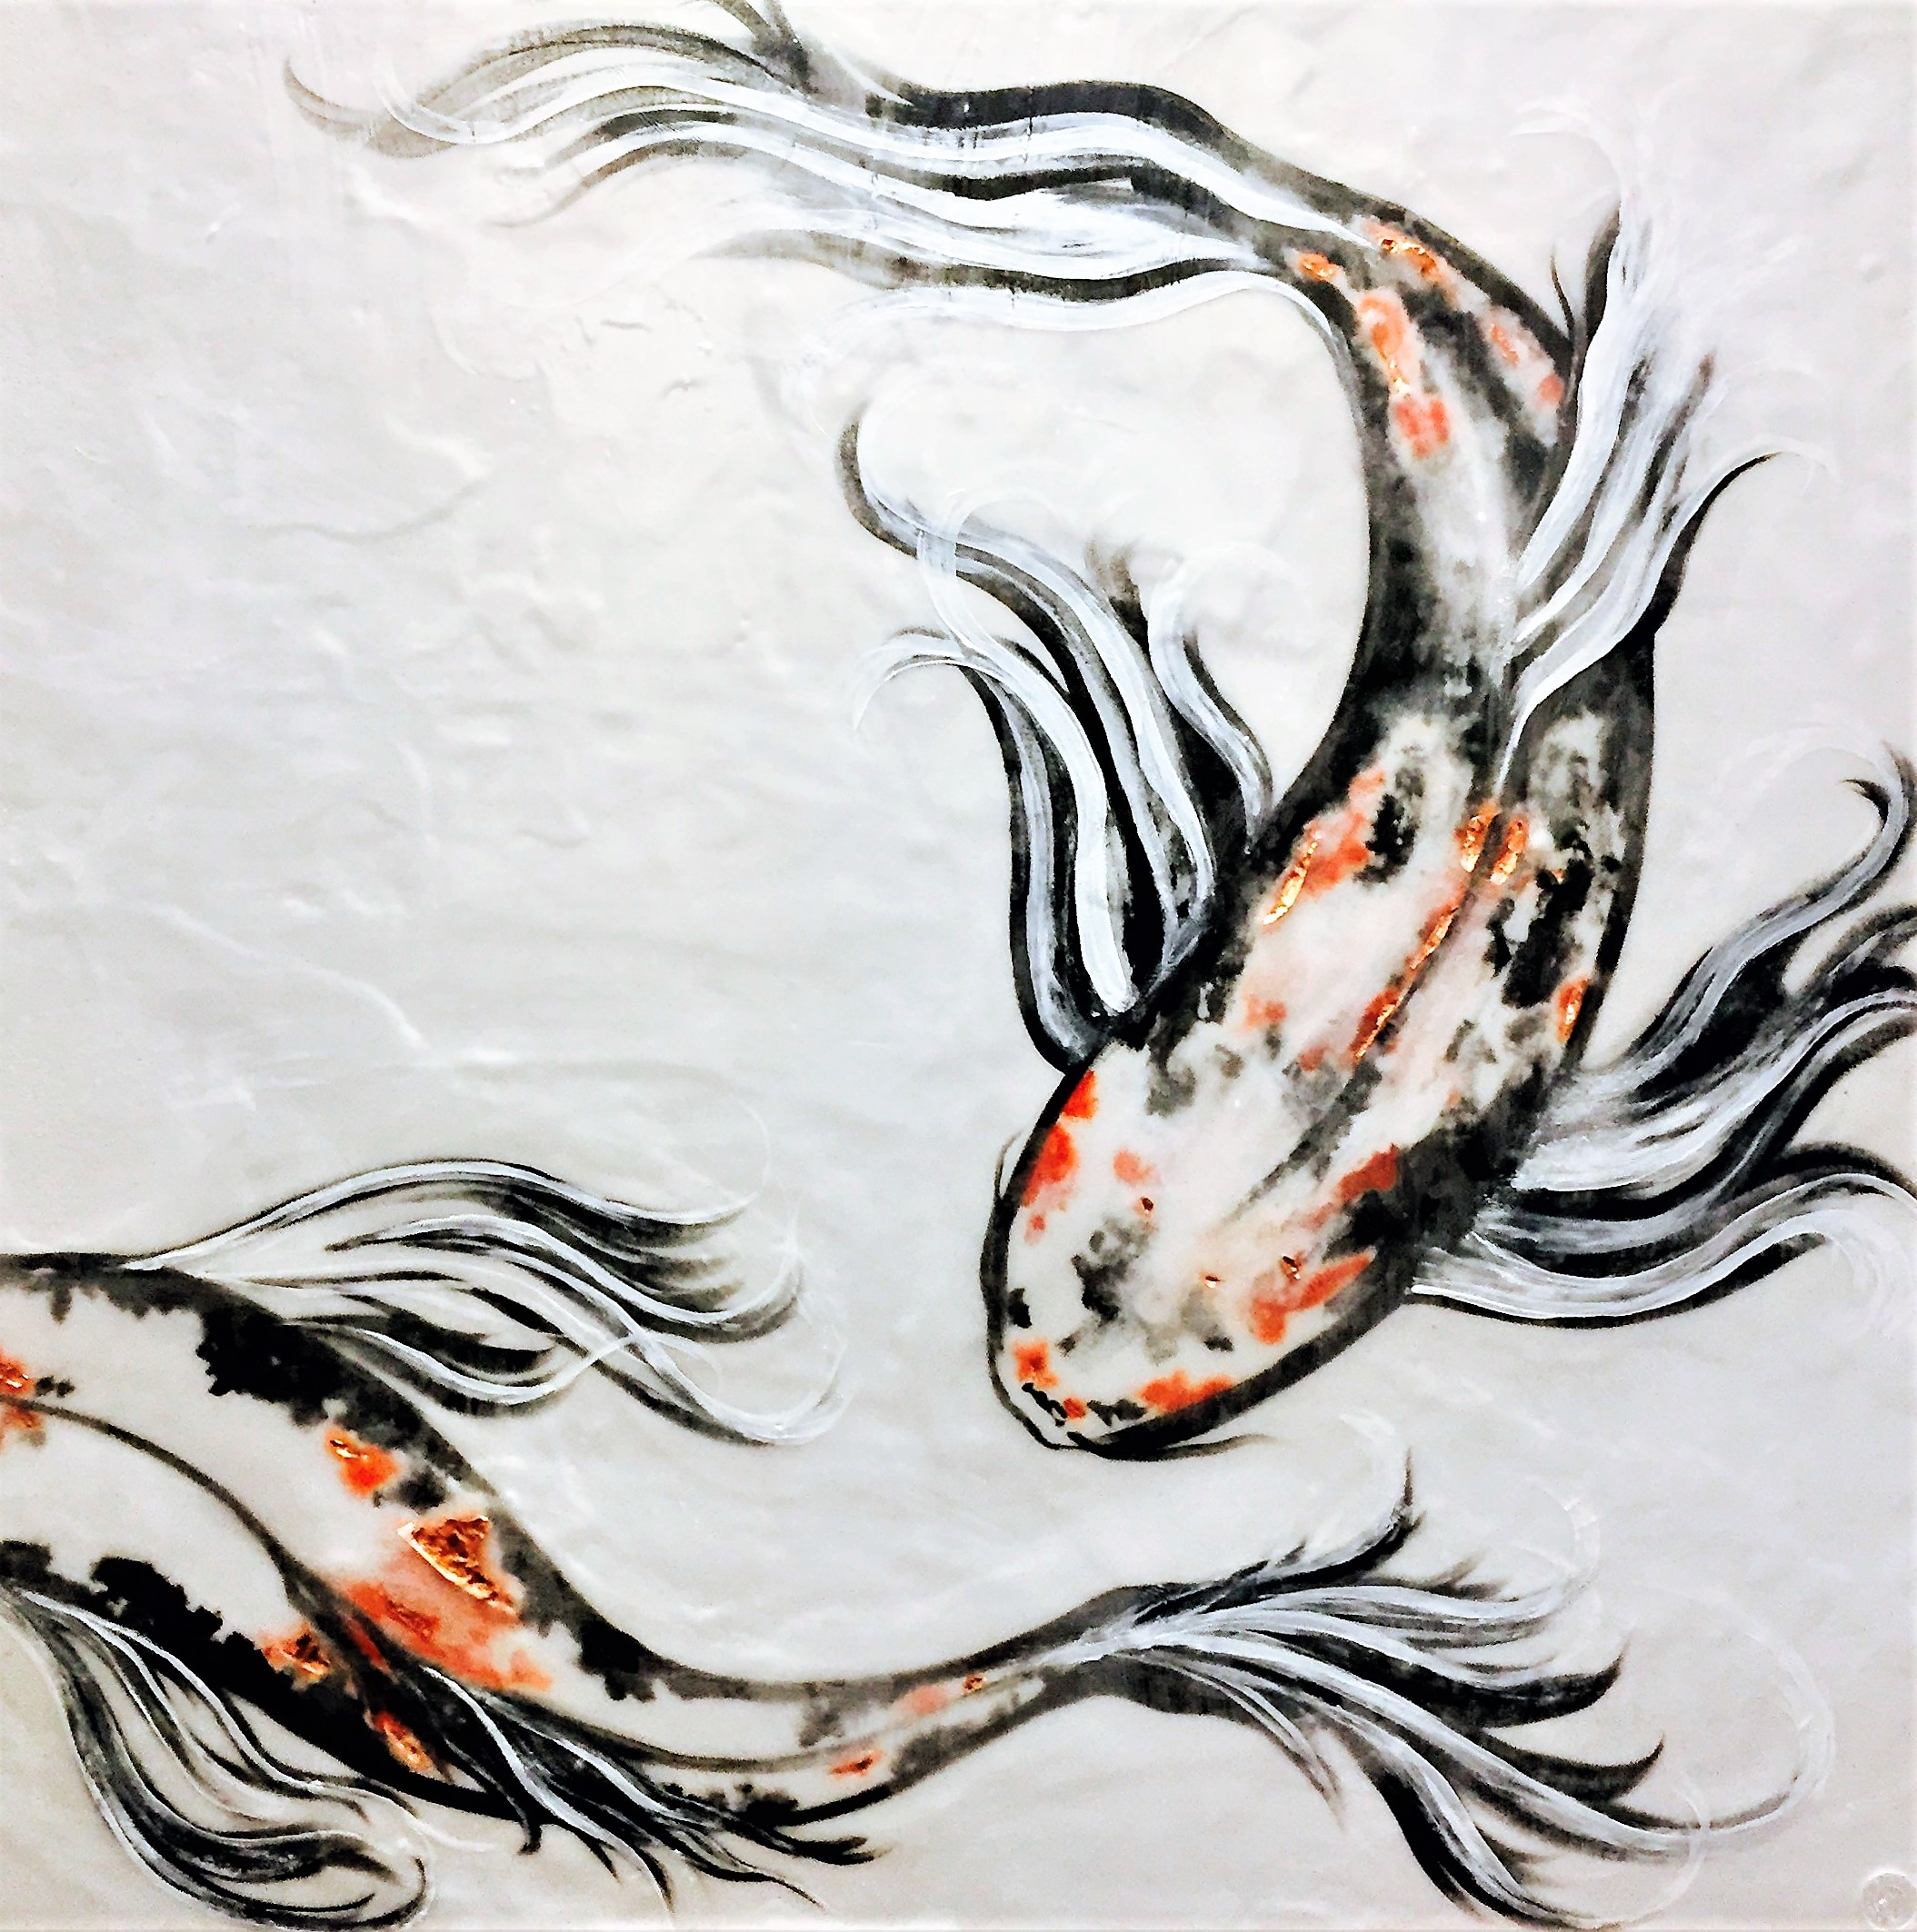 KOI FISH 1.jpg